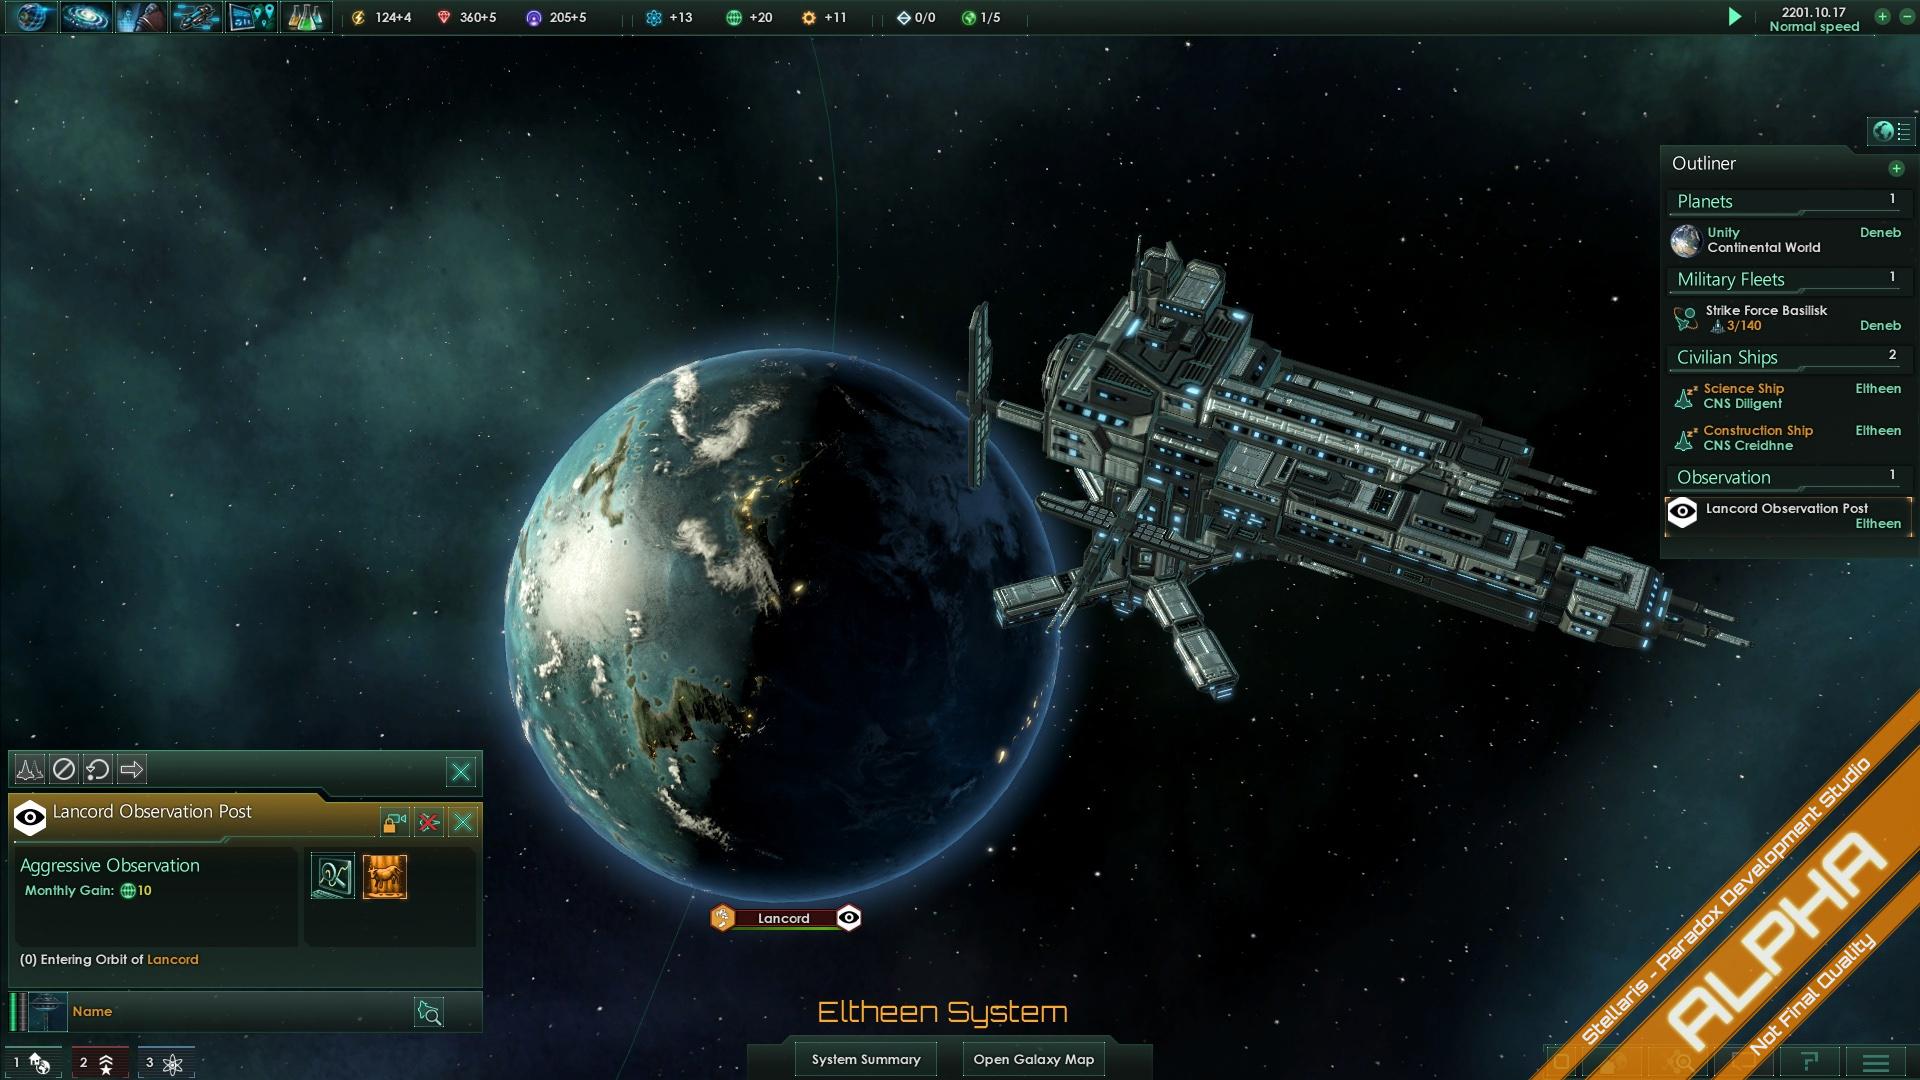 stellaris_dev_diary_13_01_20151214_observation_station.jpg